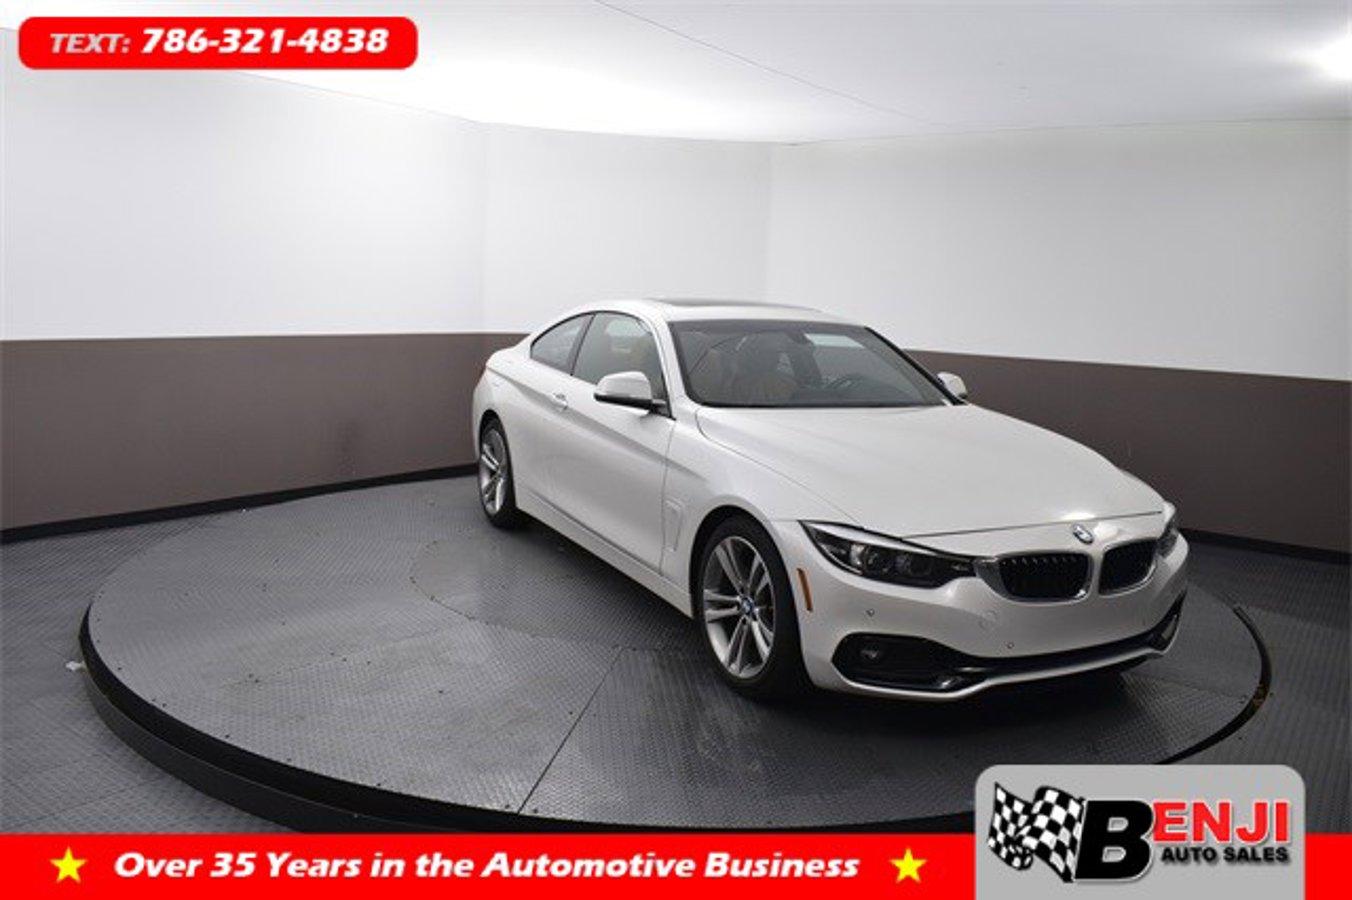 Used BMW 4-SERIES 2018 BROWARD 430I